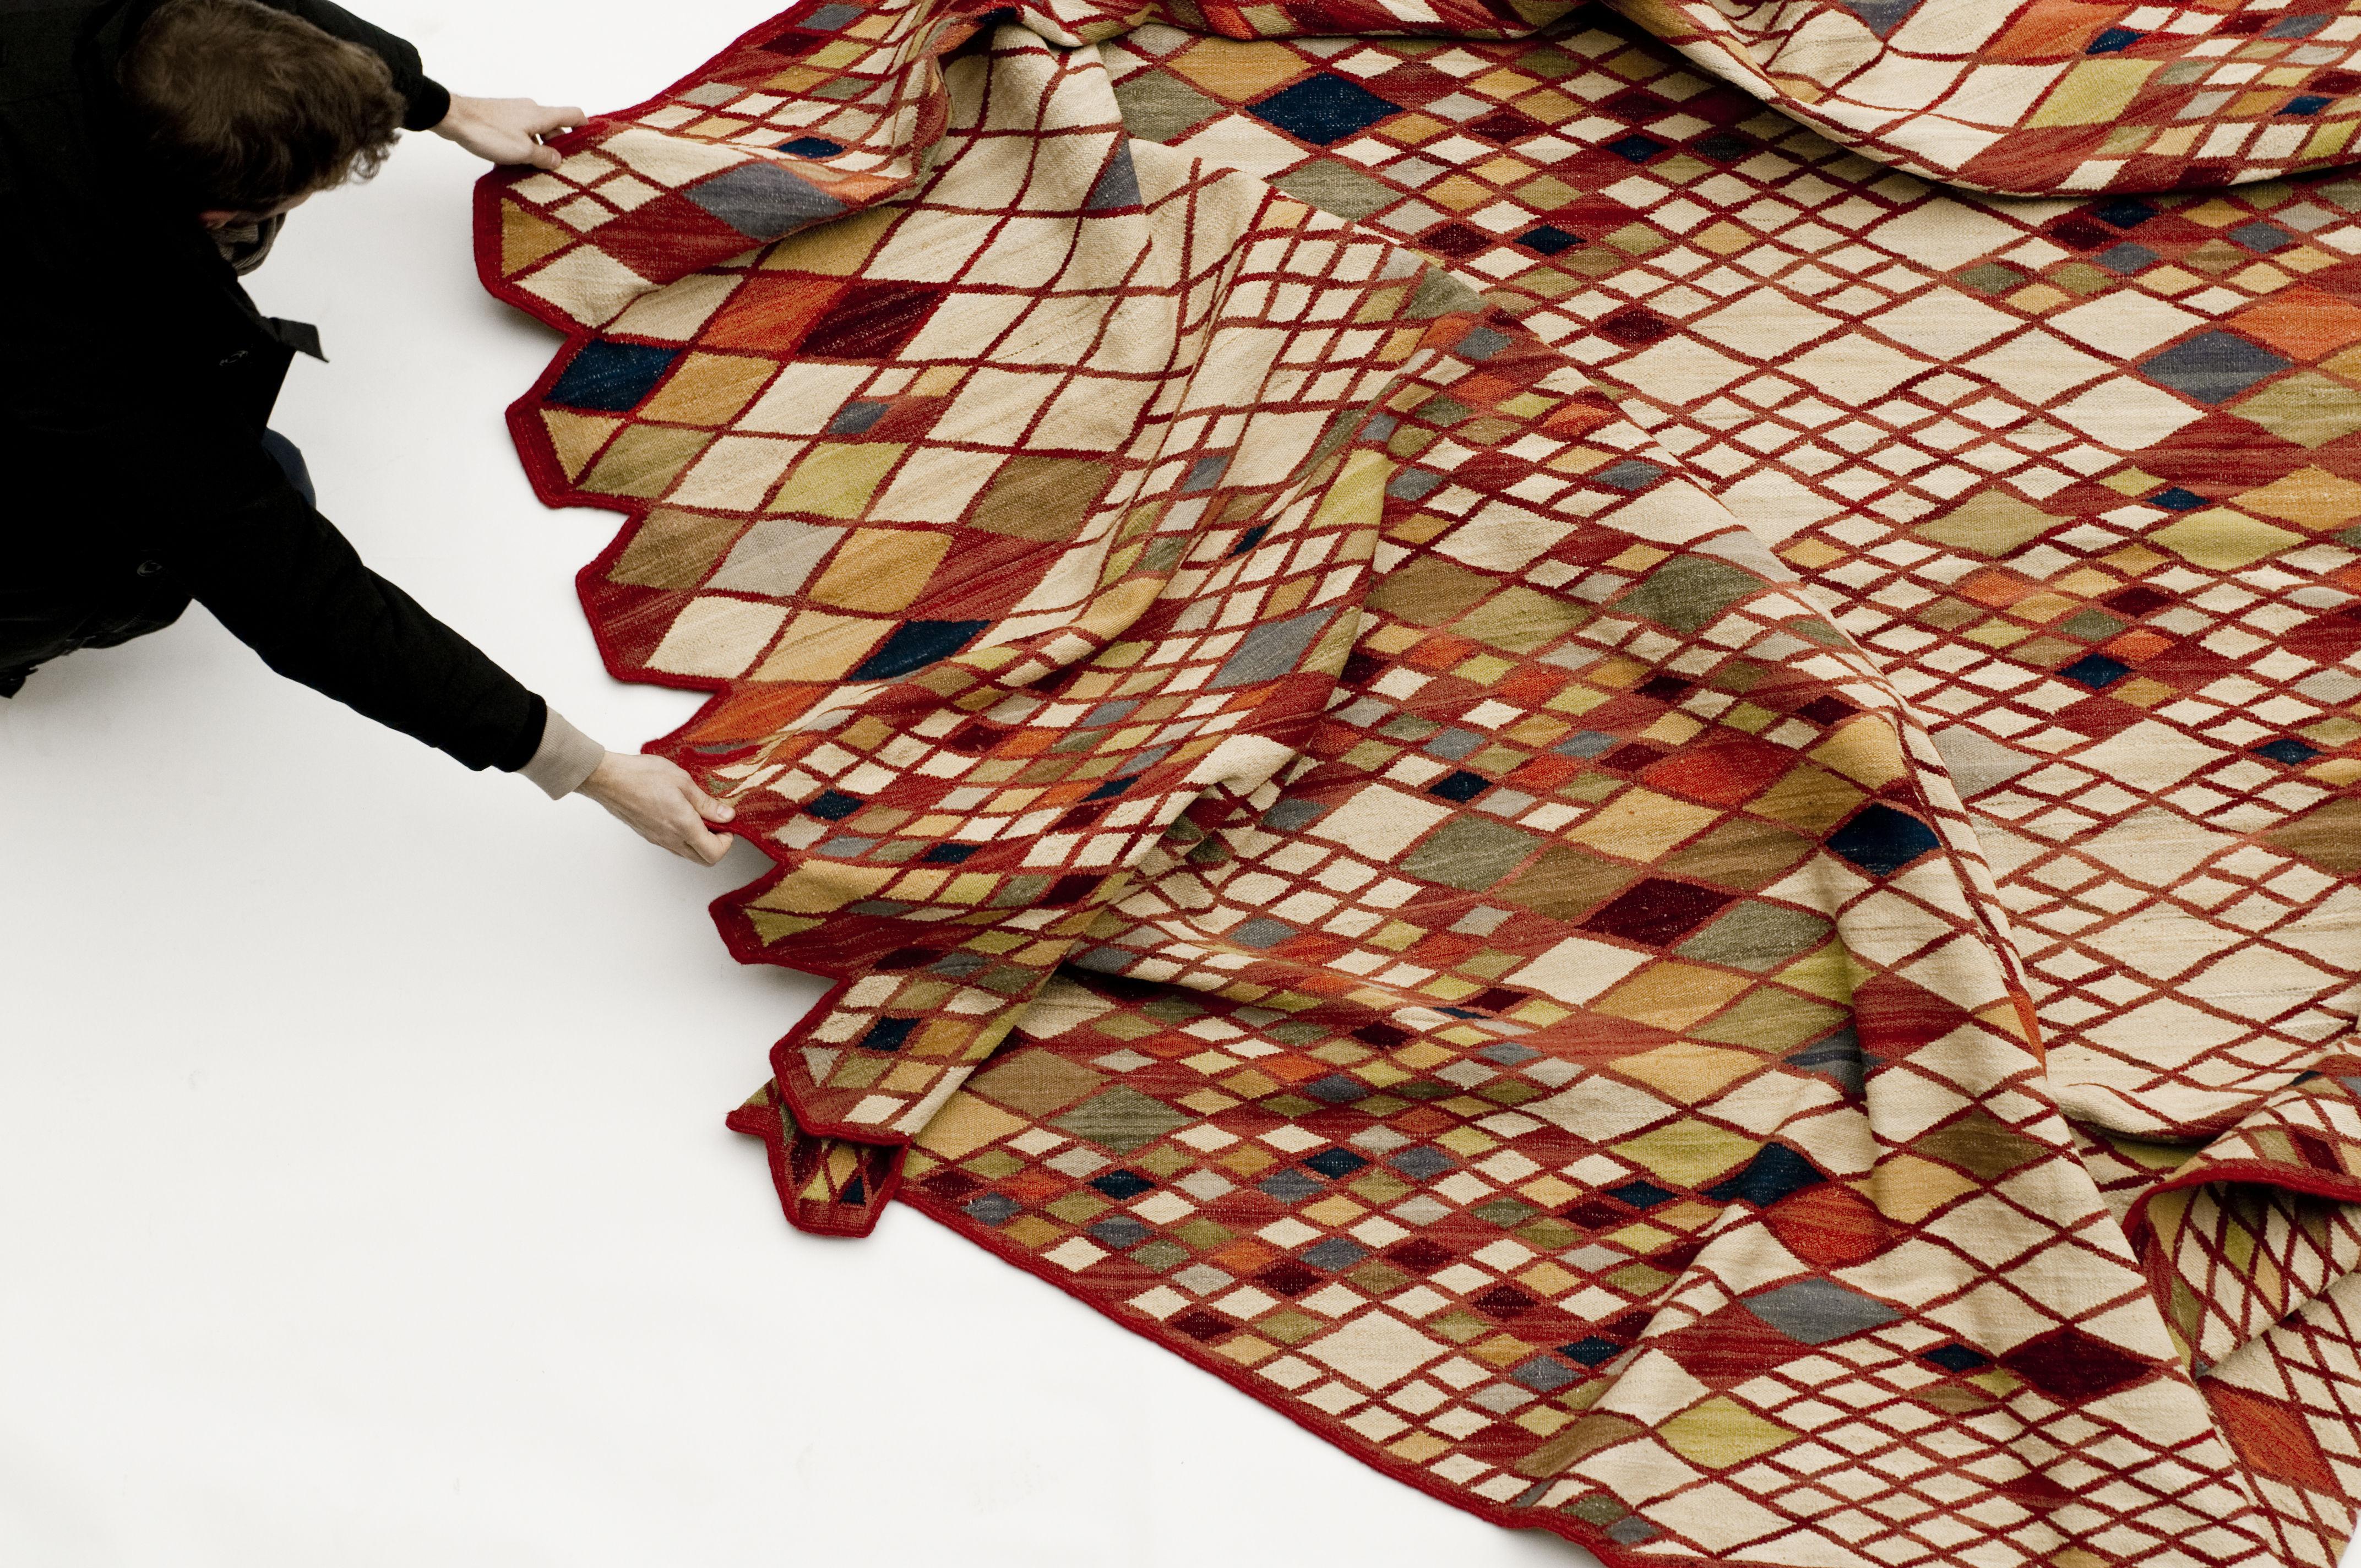 Tapis losanges 165 x 245 cm multicolore nanimarquina - Nani marquina alfombras ...